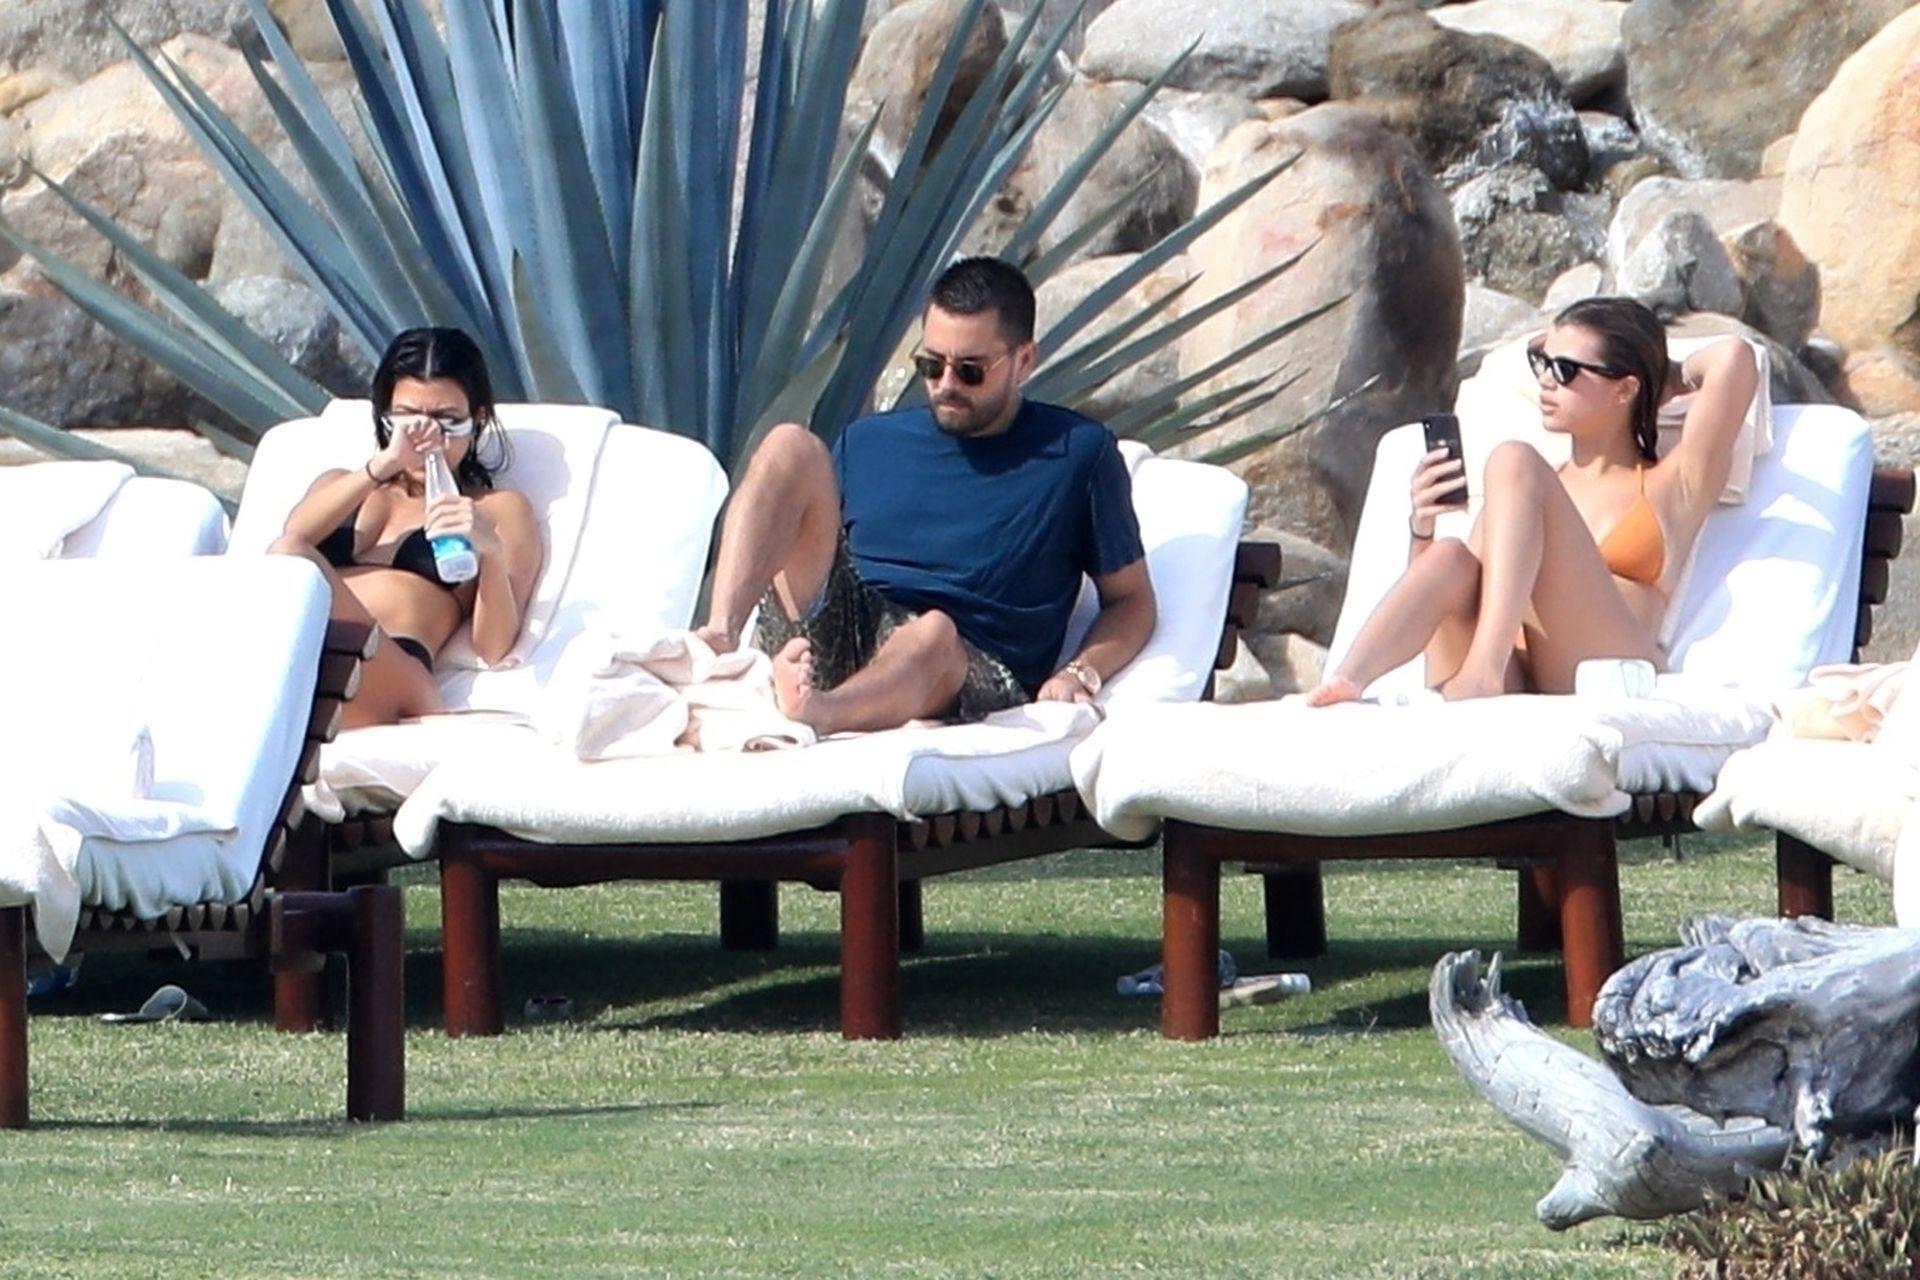 *PREMIUM-EXCLUSIVE* Three's Company for Kourtney Kardashian, Scott Disick and Sofia Richie**WEB EMBARGO UNTIL DECEMBER 24, 2018 at 11:00 AM PST** Scott Disick, Kourtney Kardashian, Sofia Richie